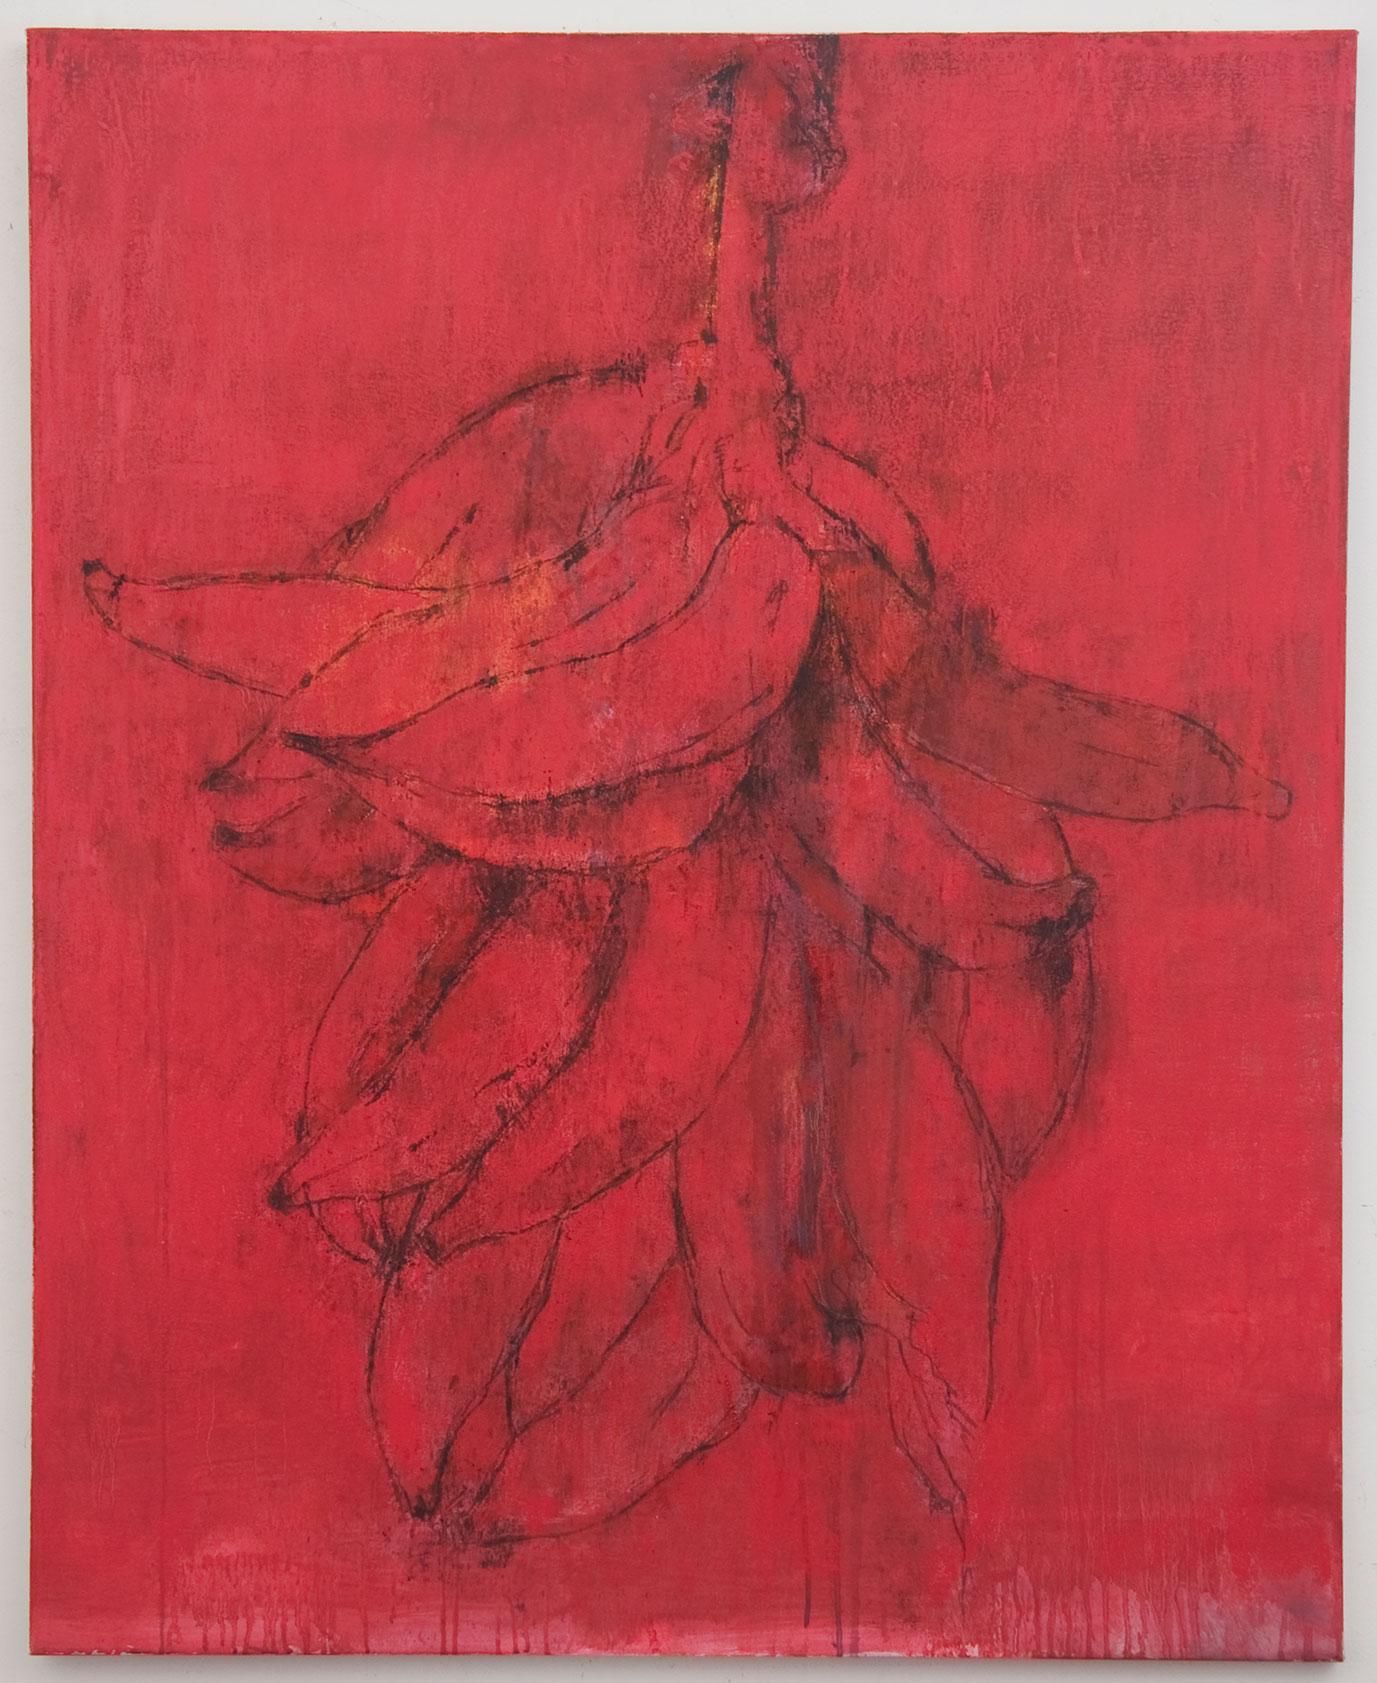 """Platanos Rojos"" by Jose Camacho"